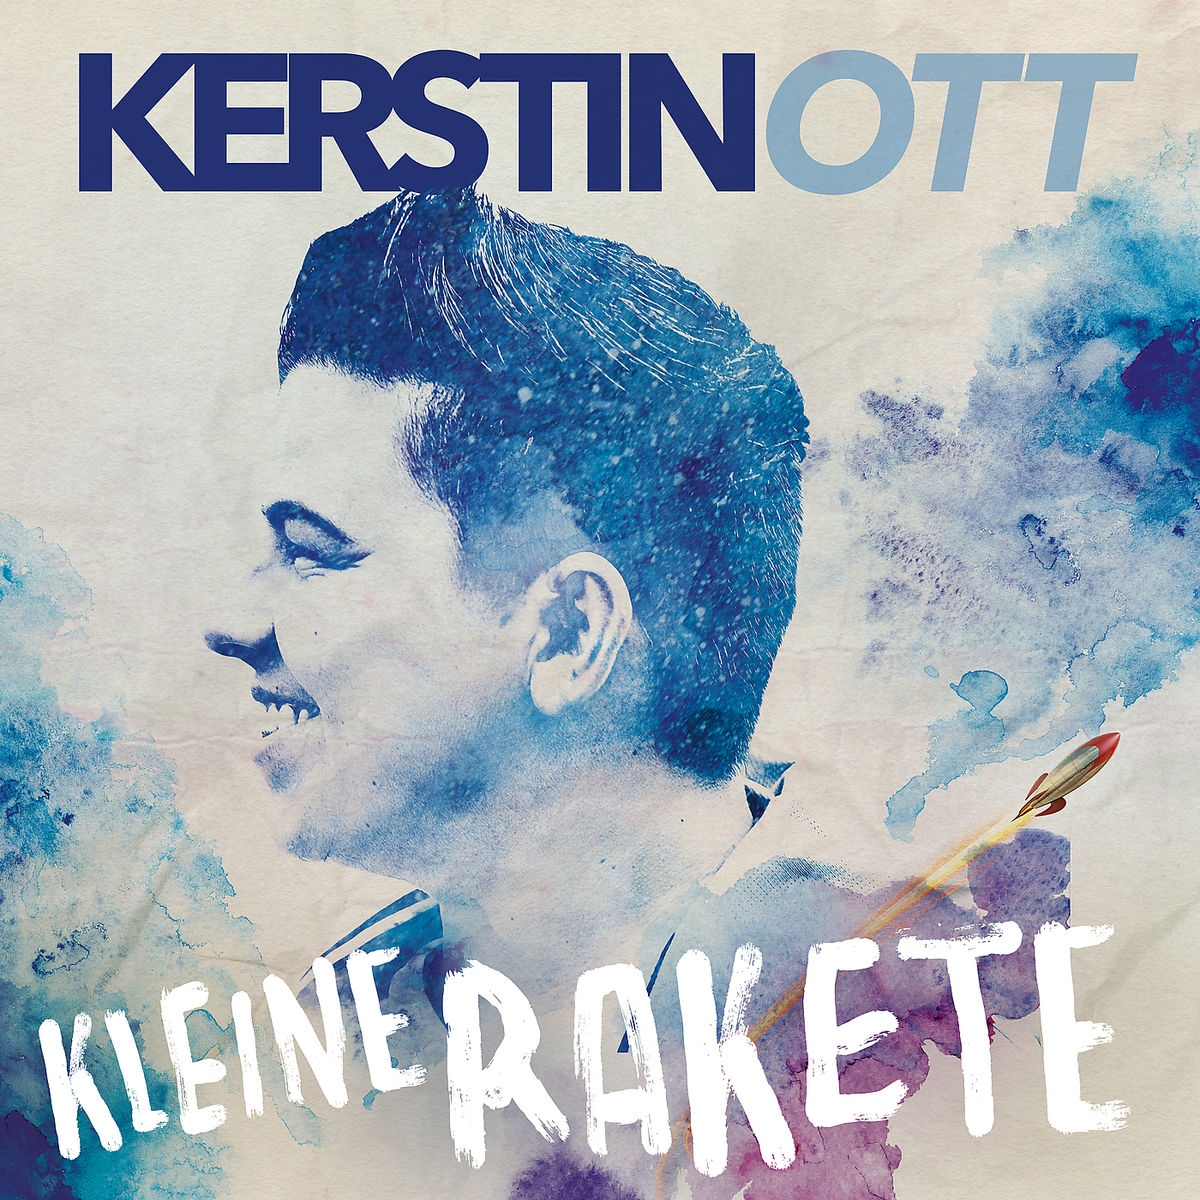 KERSTIN OTT - Kleine Rakete (Poydor/Universal/UV)